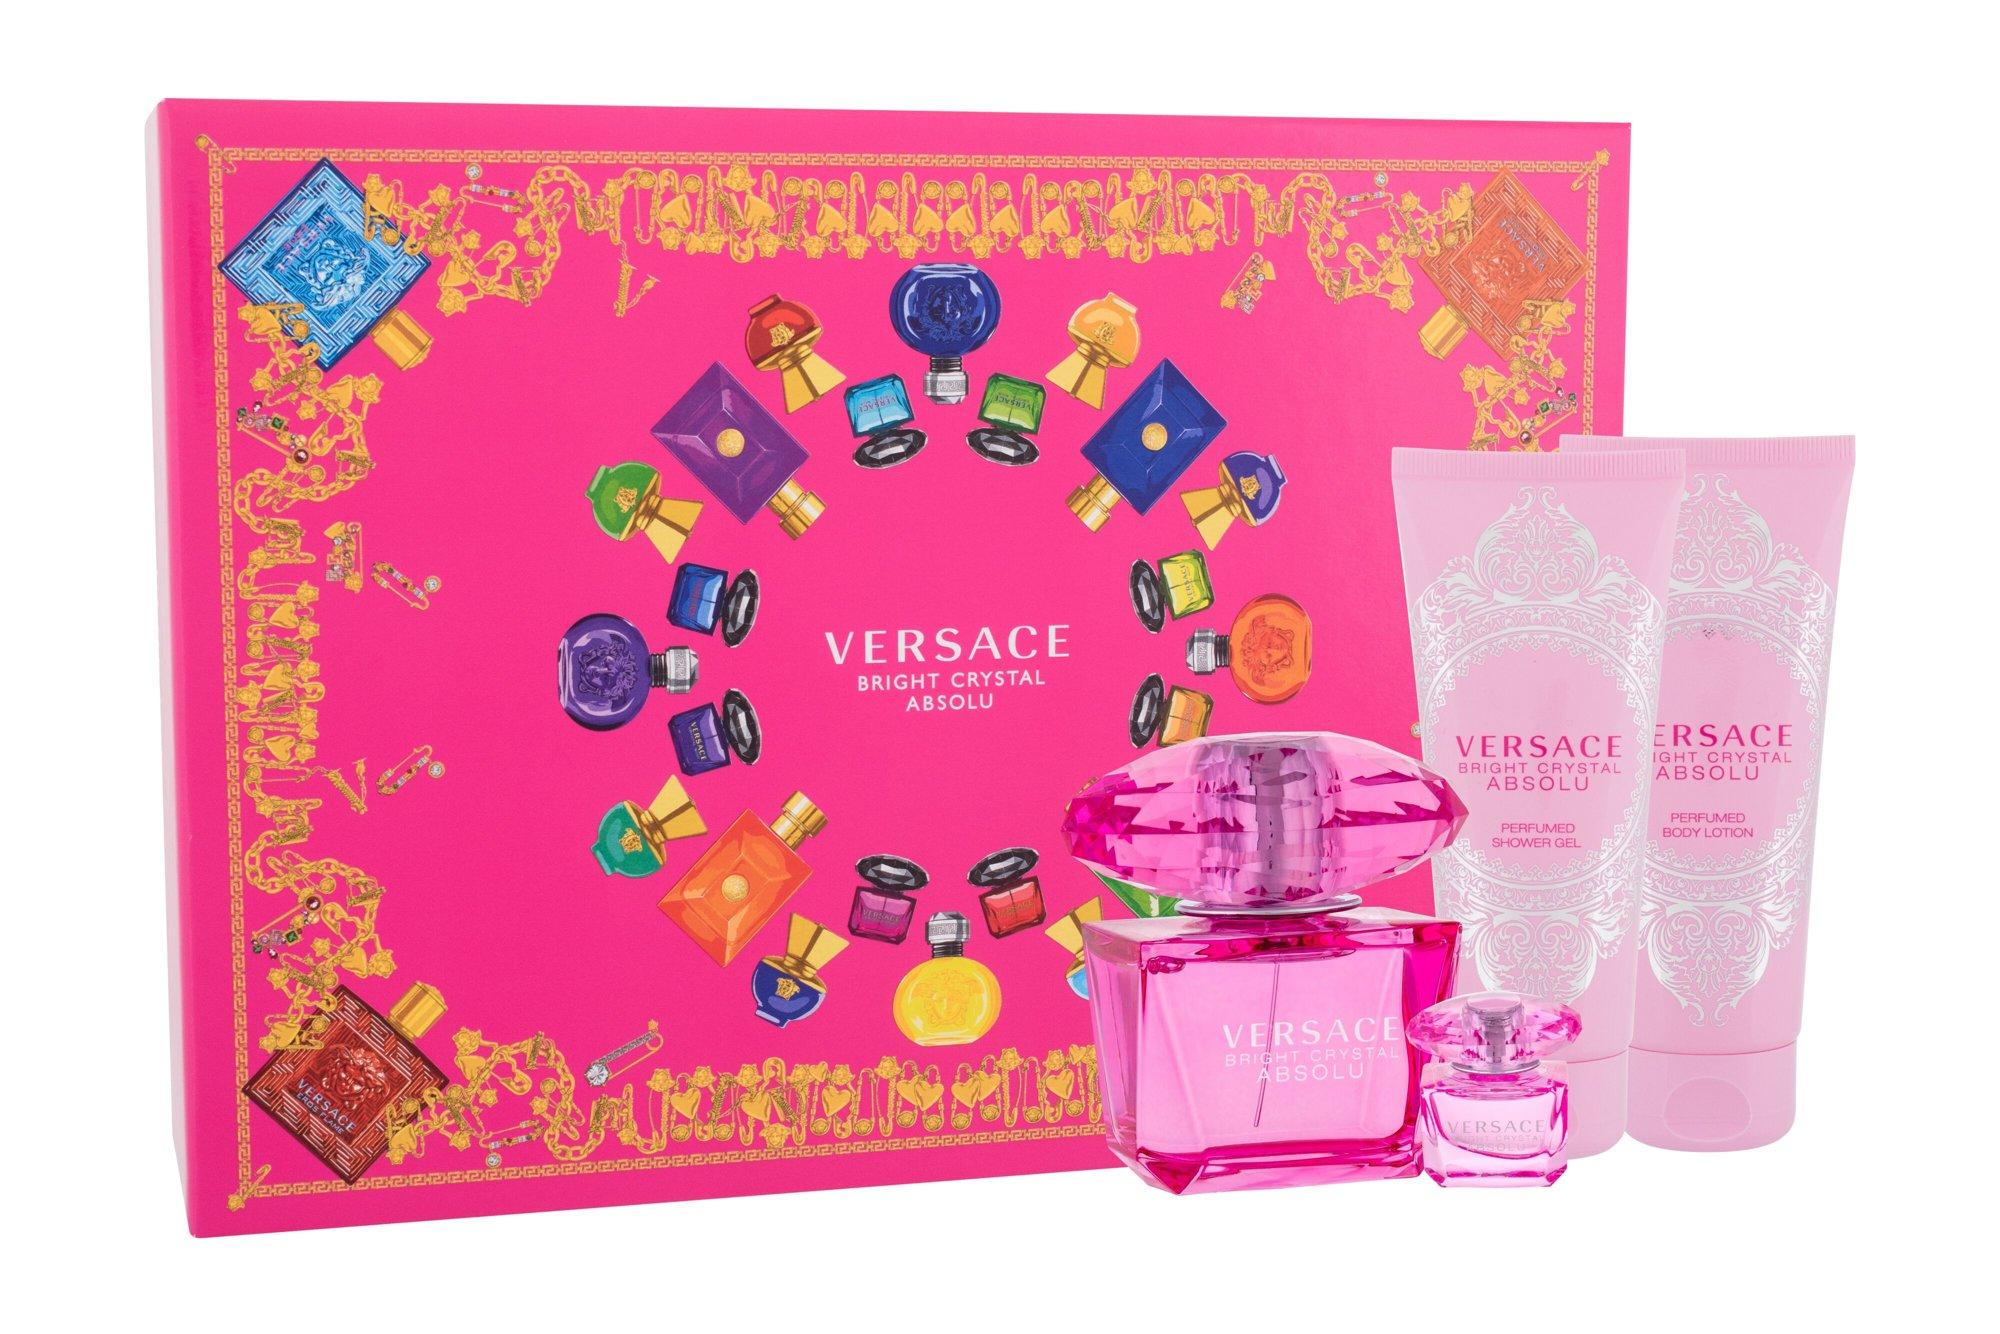 Versace Bright Crystal Absolu, parfumovaná voda 90 ml + sprchovací gél 100 ml + parfumovaná voda 5 ml + telové mlieko 100 ml